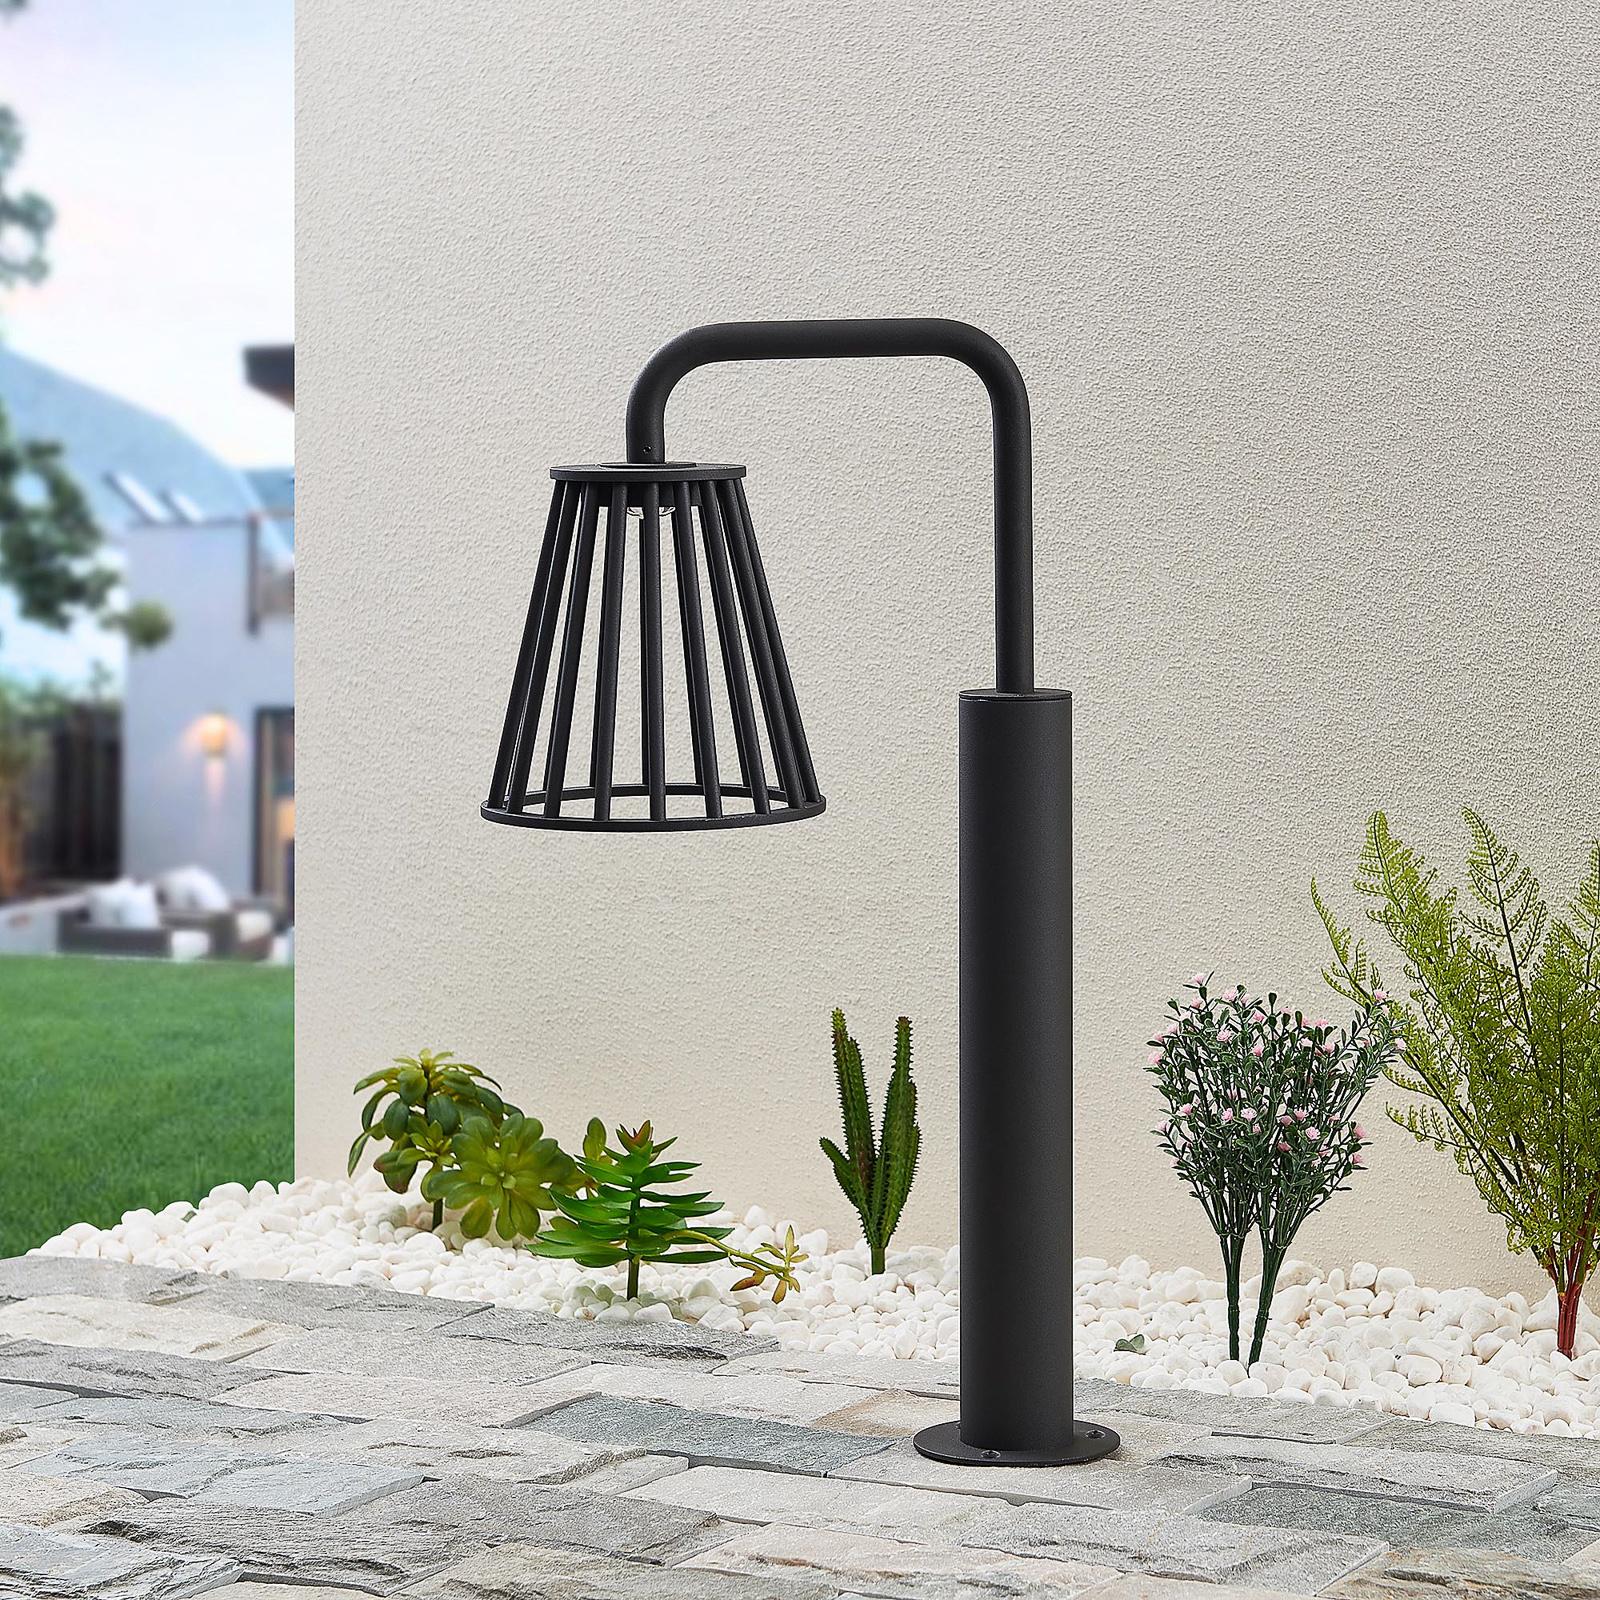 Lucande Miray -LED-ulkopylväsvalaisin, 60 cm